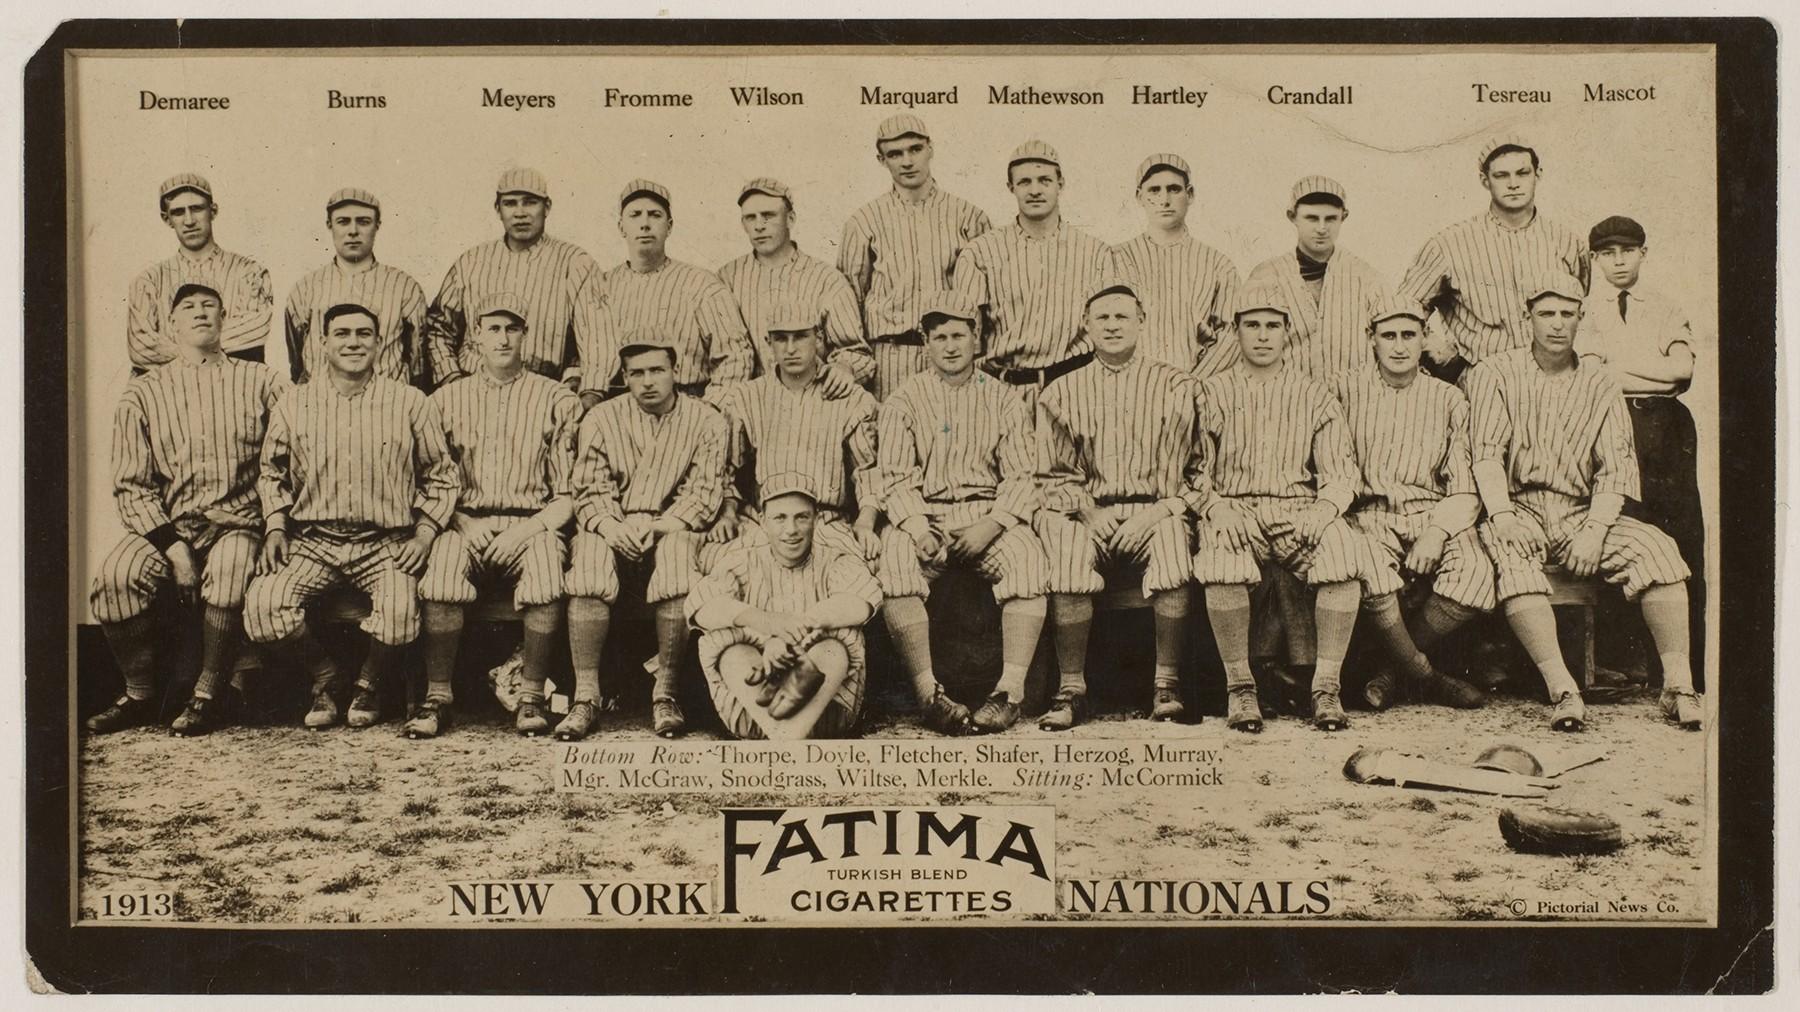 Metropolitan Museum Set To Exhibit Portion Of Famed Baseball Card